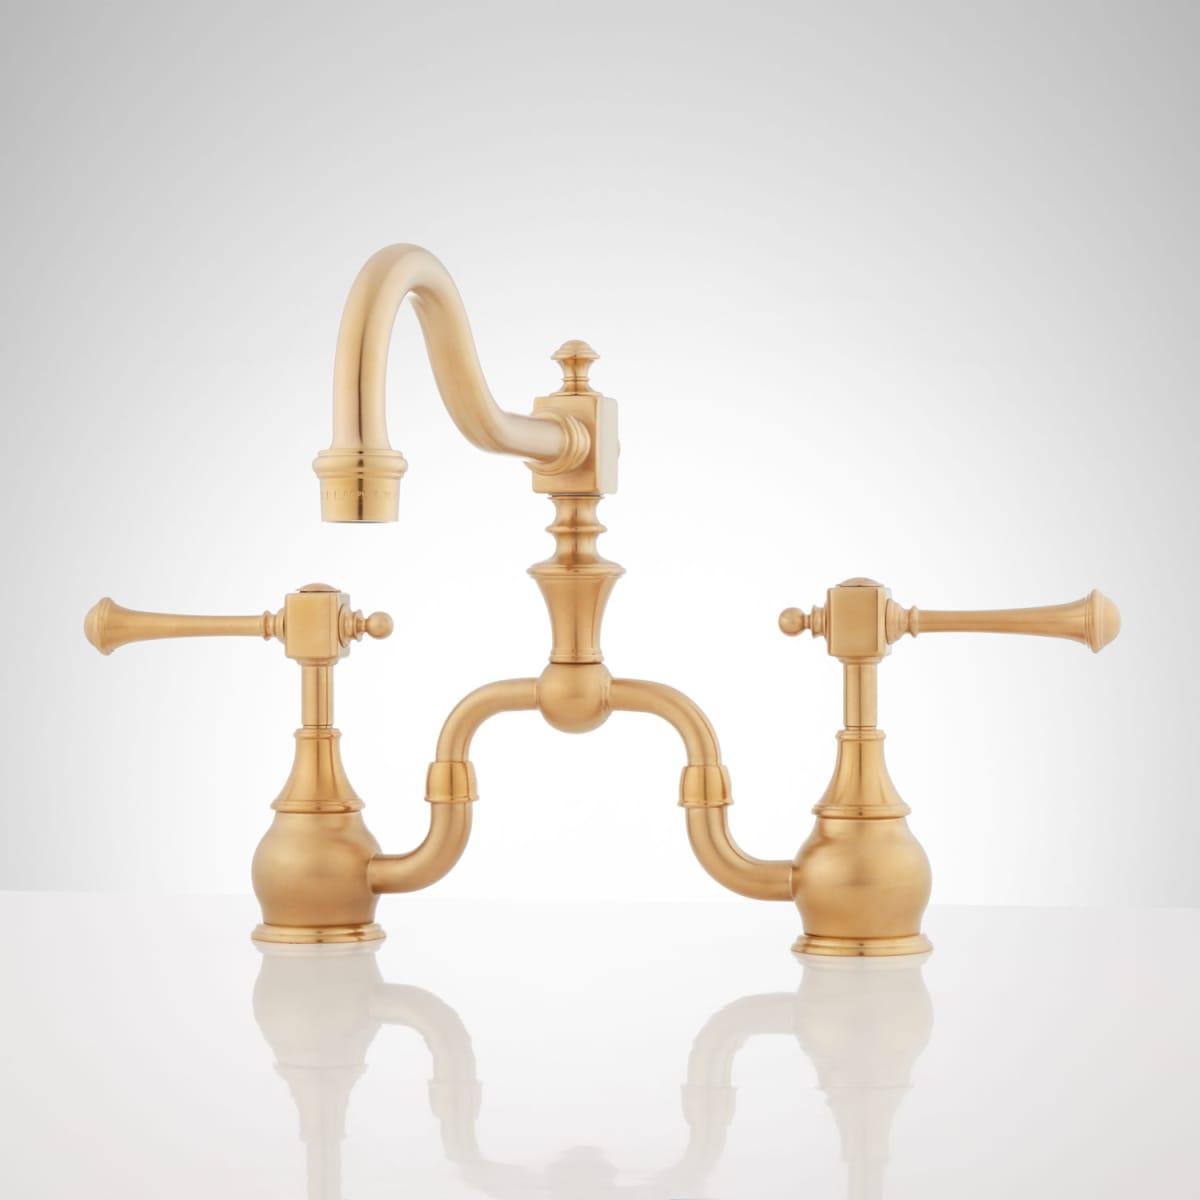 Signature Hardware Vintage Bridge Kitchen Faucet in Polished Brass